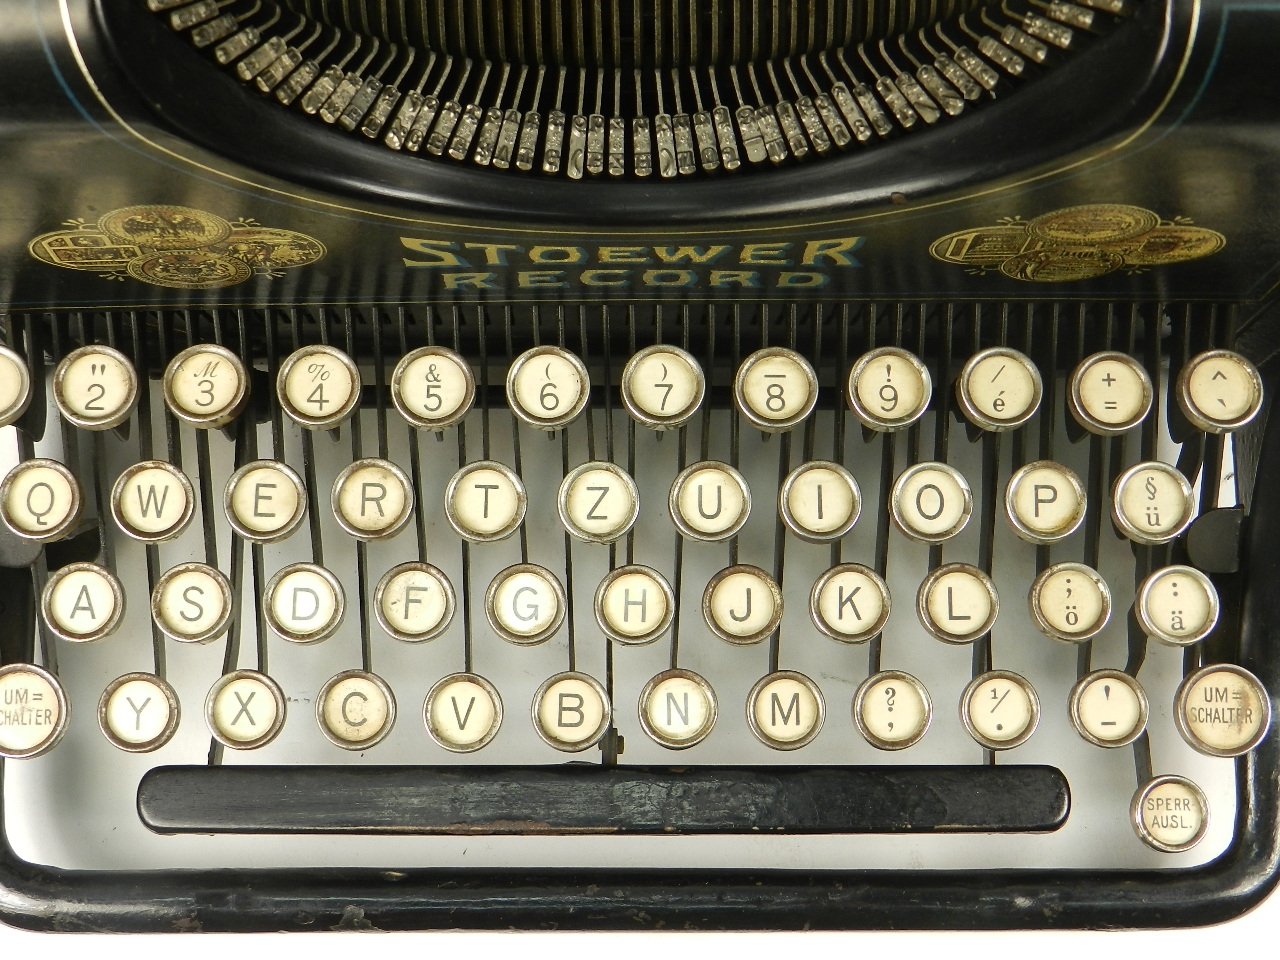 Imagen STOEWER RECORD AÑO 1910 27376